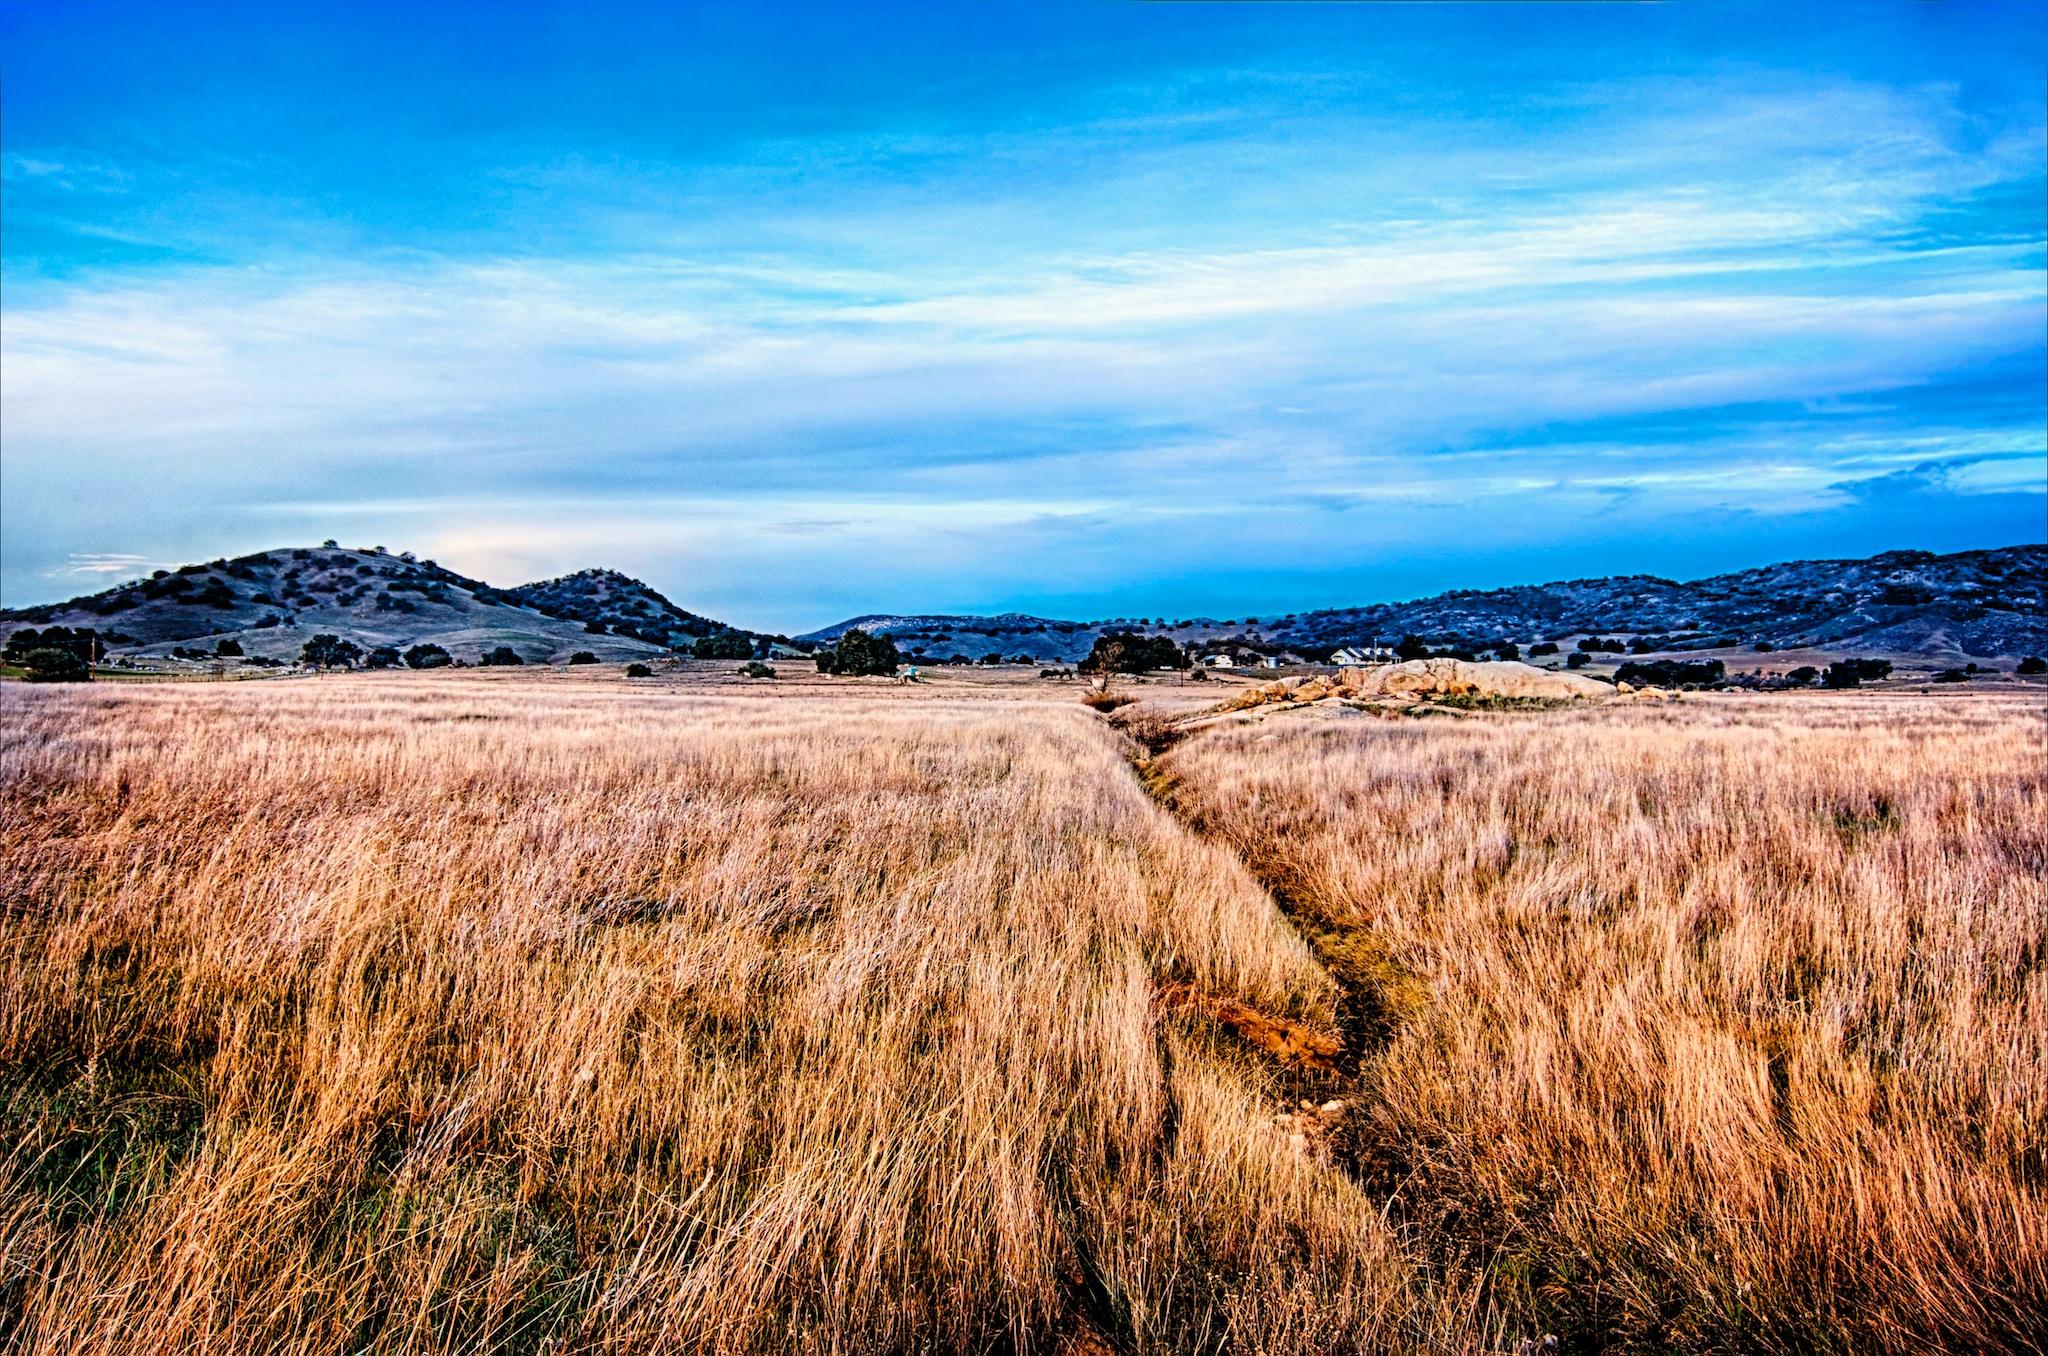 The Grassy Meadow, Santa Ysabel, California